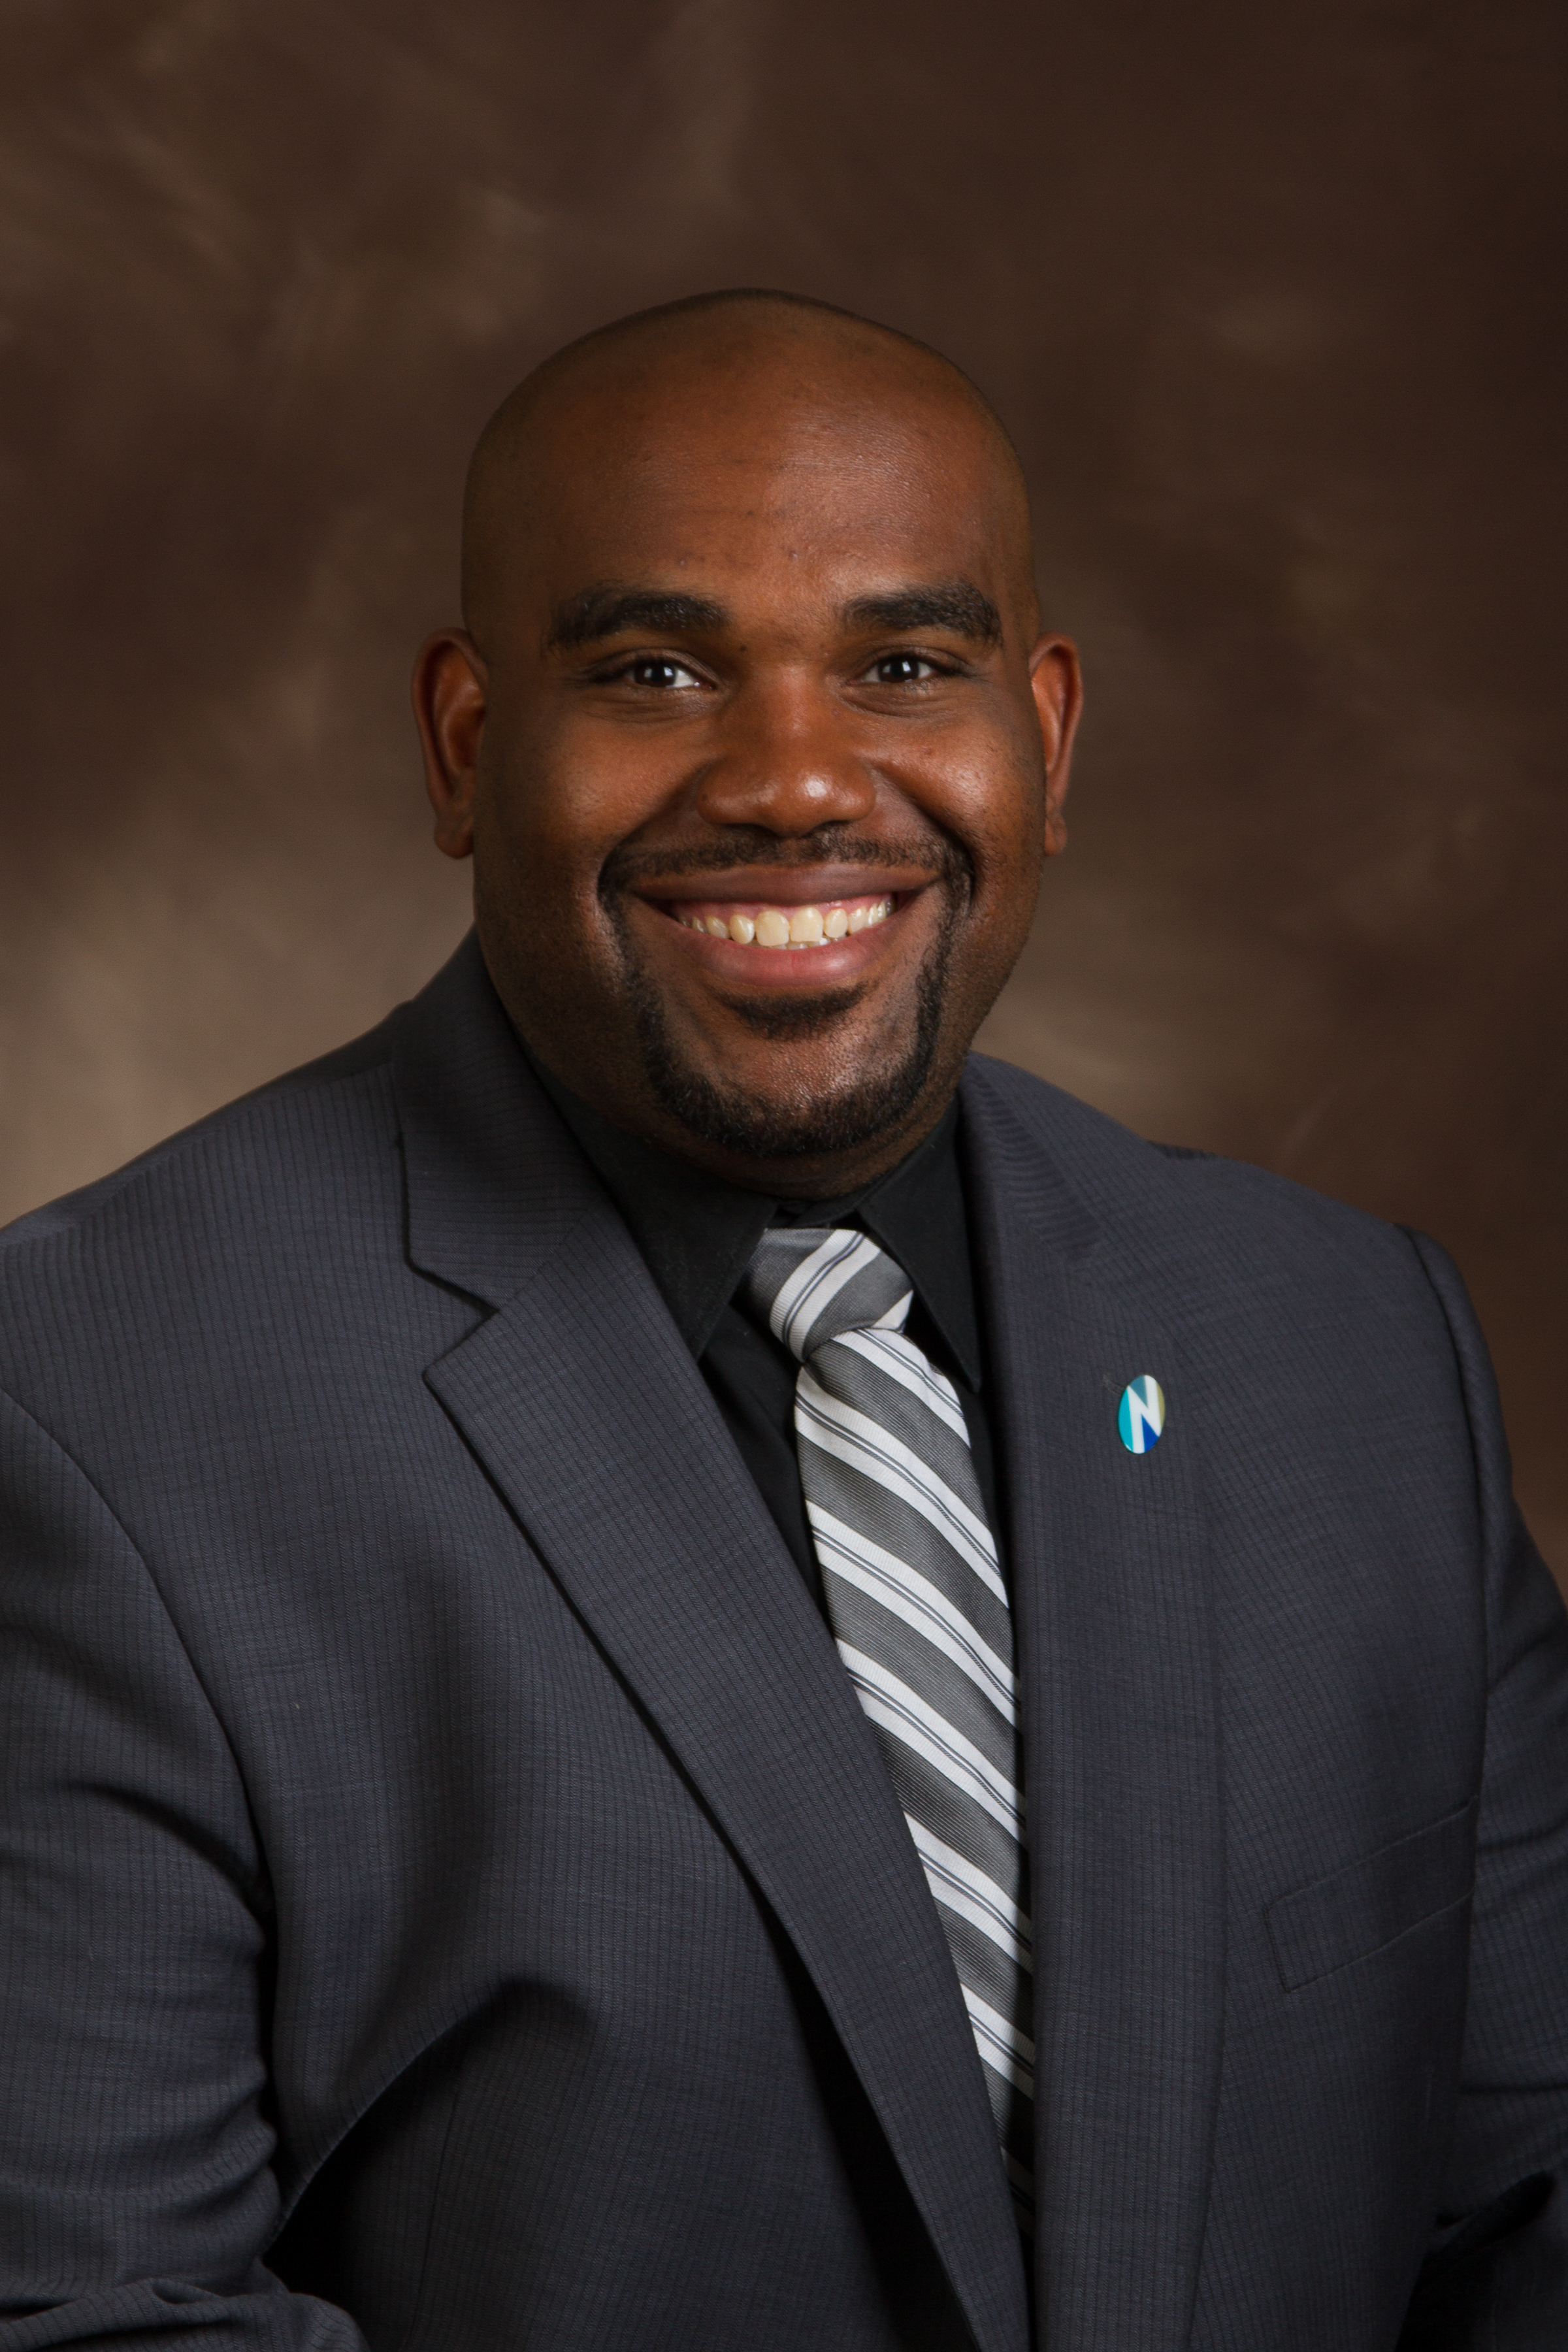 Nth Scholar Dukens Labaze  -University of New Mexico School of Medicine  Preceptor Dr. J.MadumeKerina -TriCounty Orthopaedics  Leesburg, FL